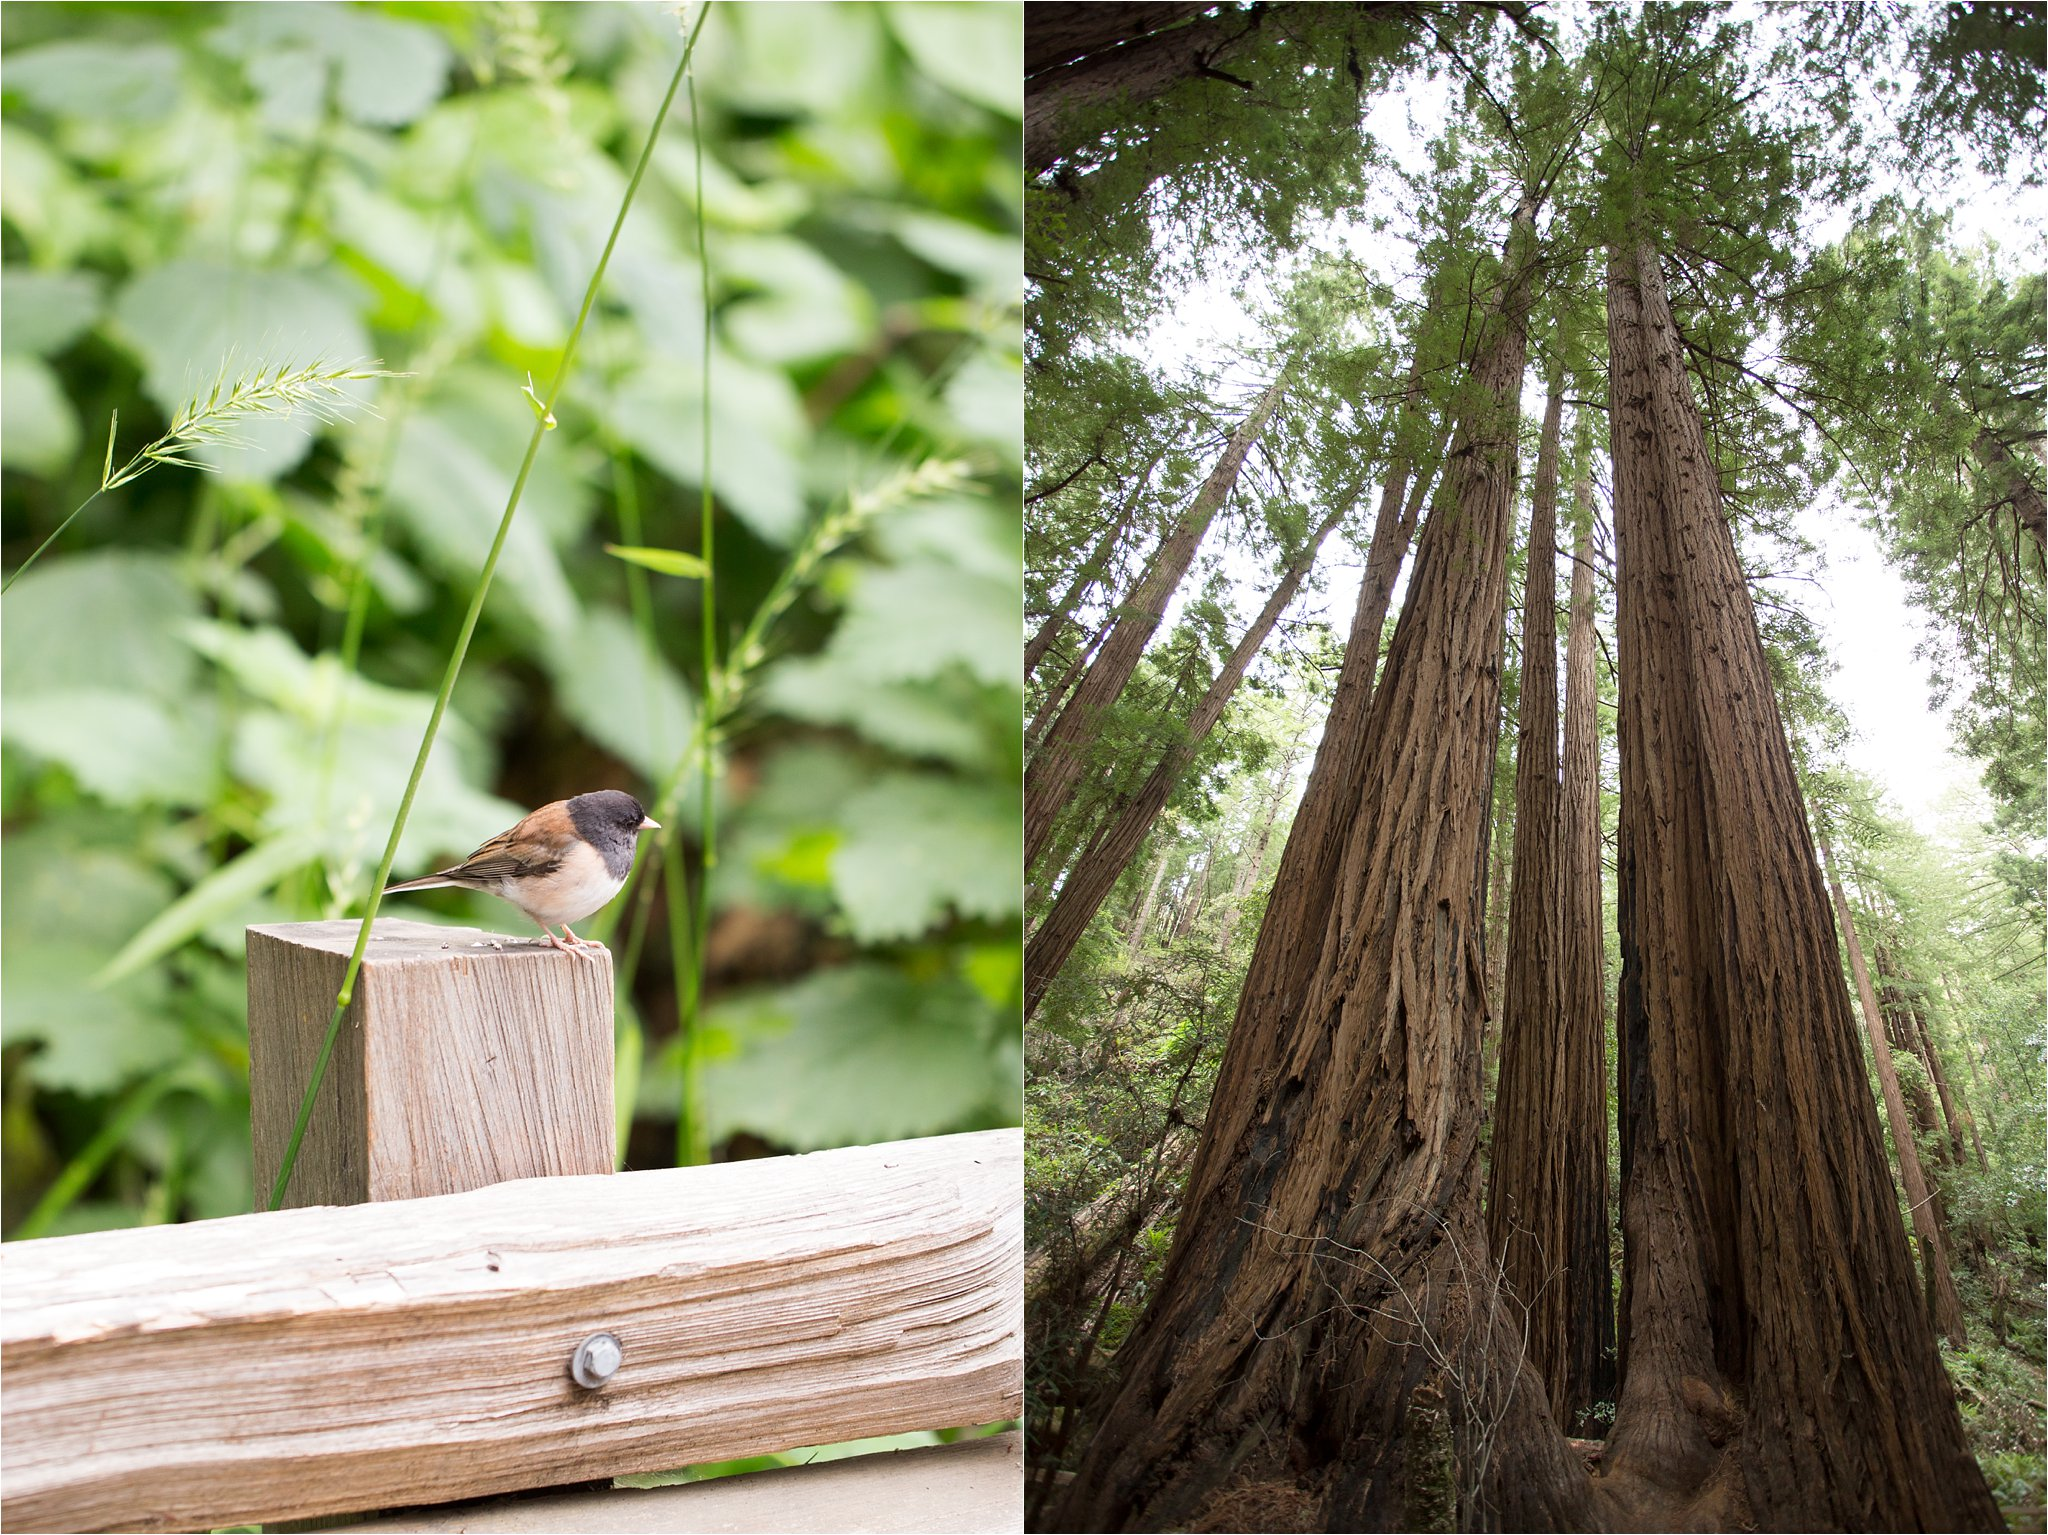 Songbird and Muir Woods